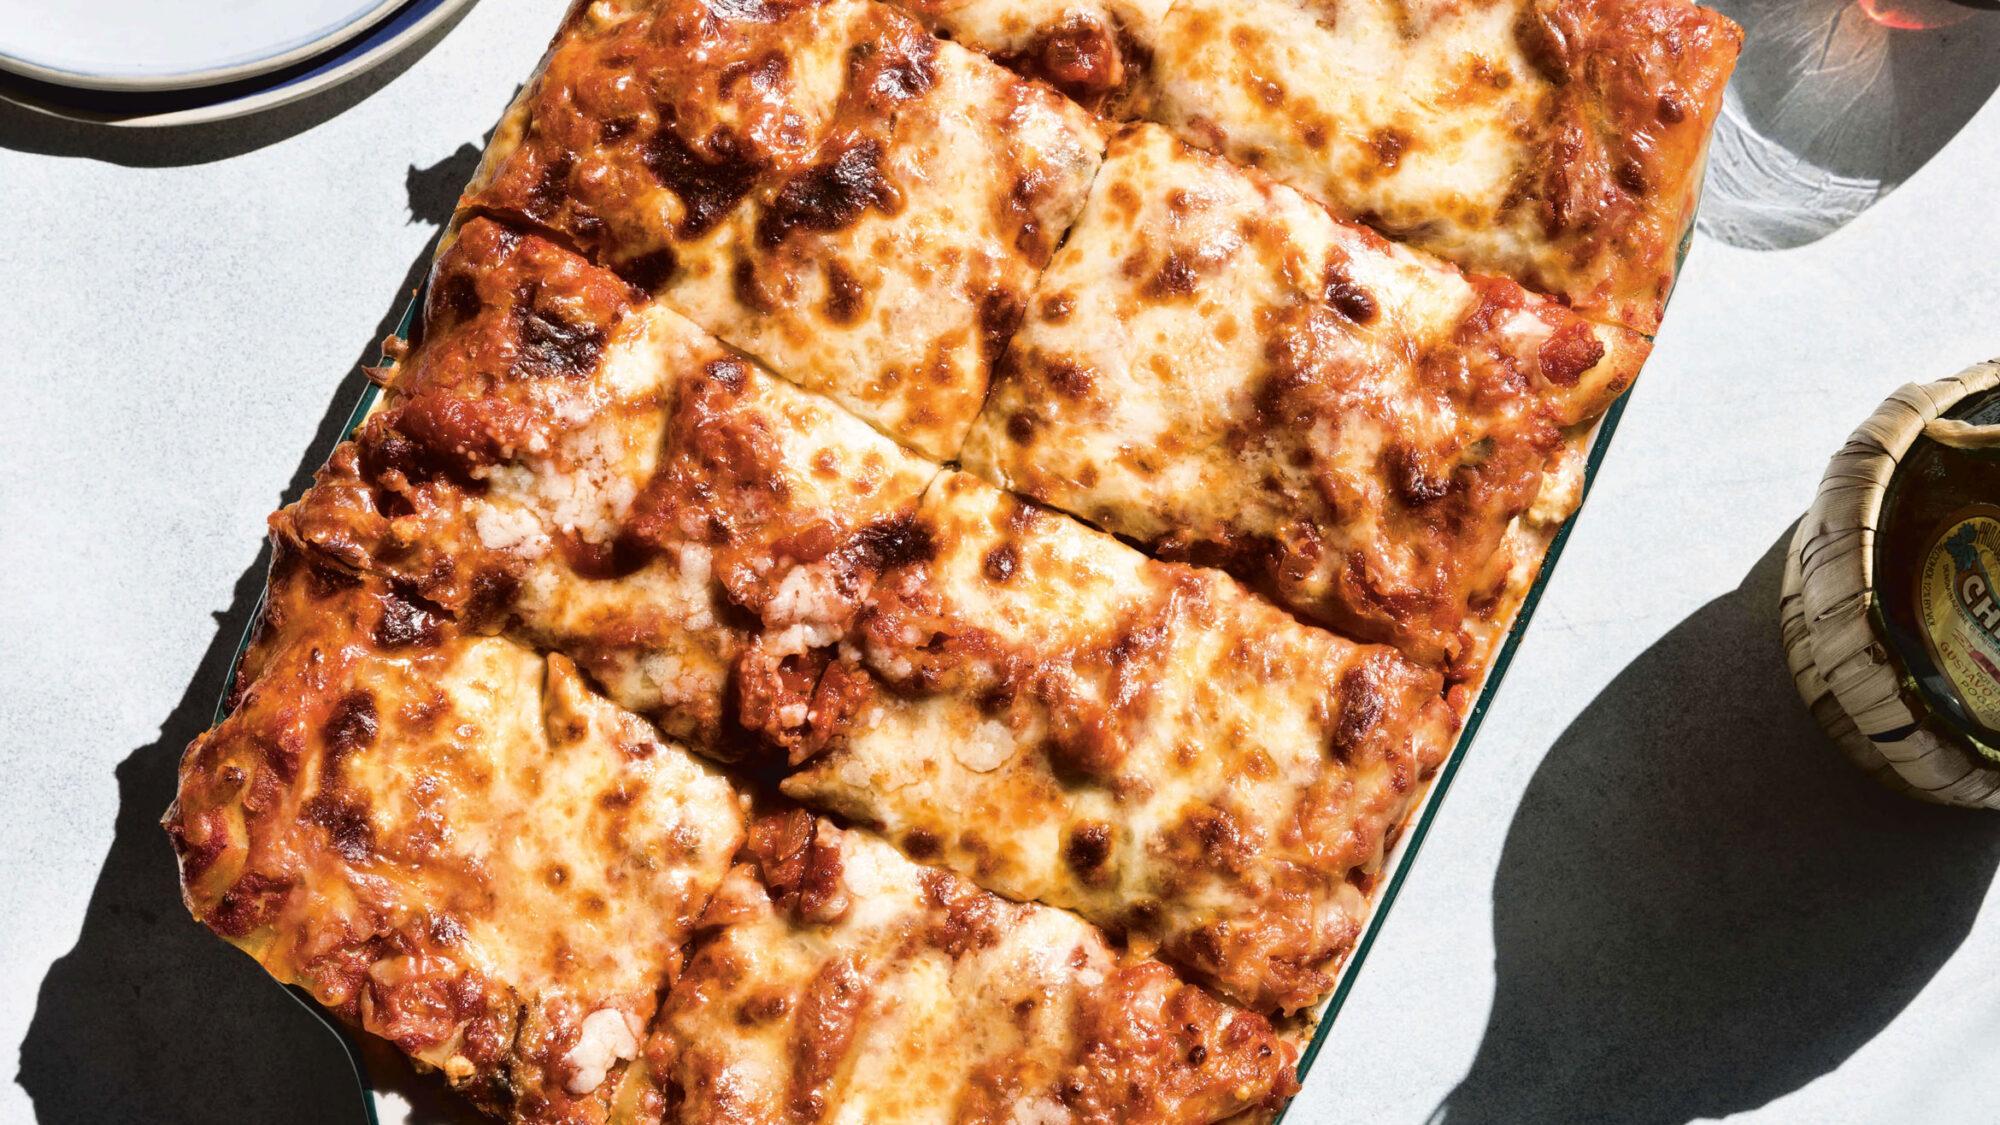 Article-Porchetta-Spiced-Pork-Shoulder-Lasagna-Recipe